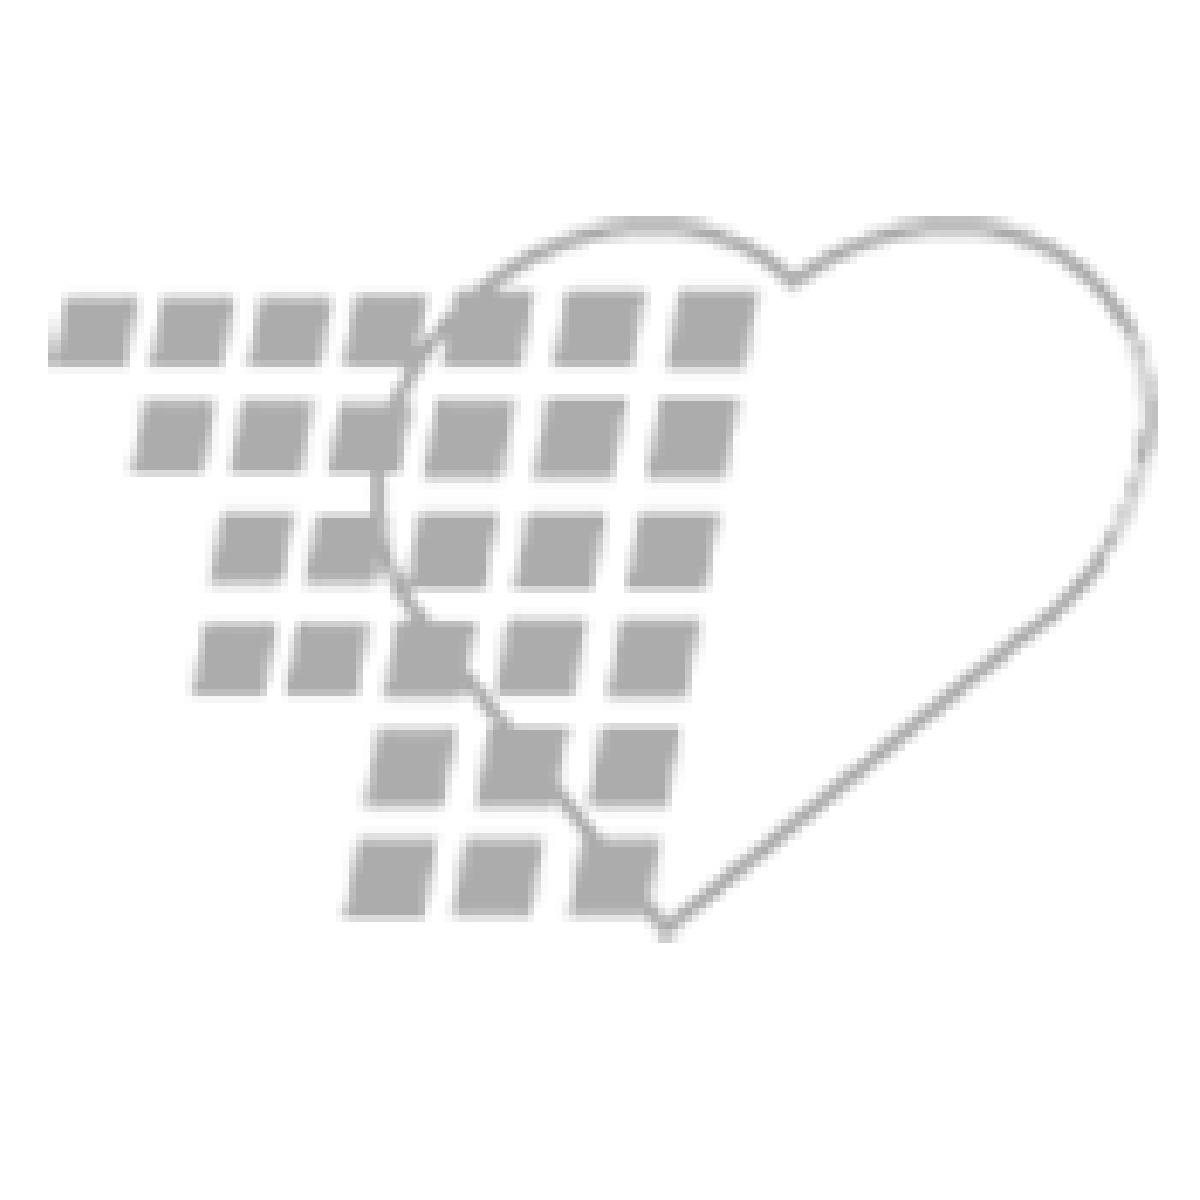 06-93-1423 - Demo Dose® Tazicf 1g/10mL yellow powder vial 10mL